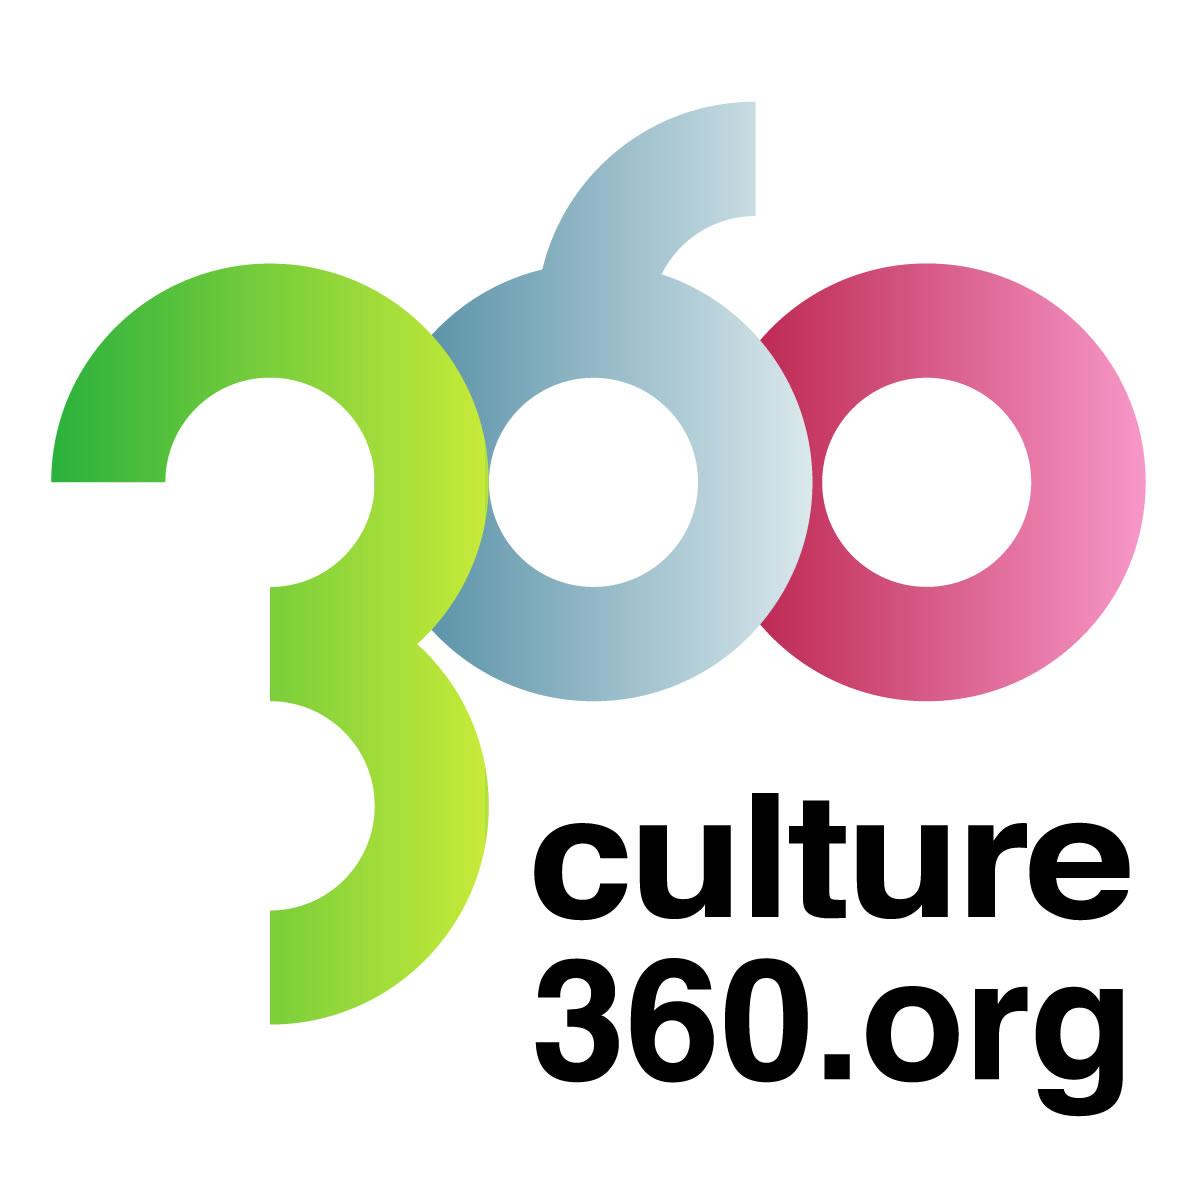 c360-logo-colour-square-web